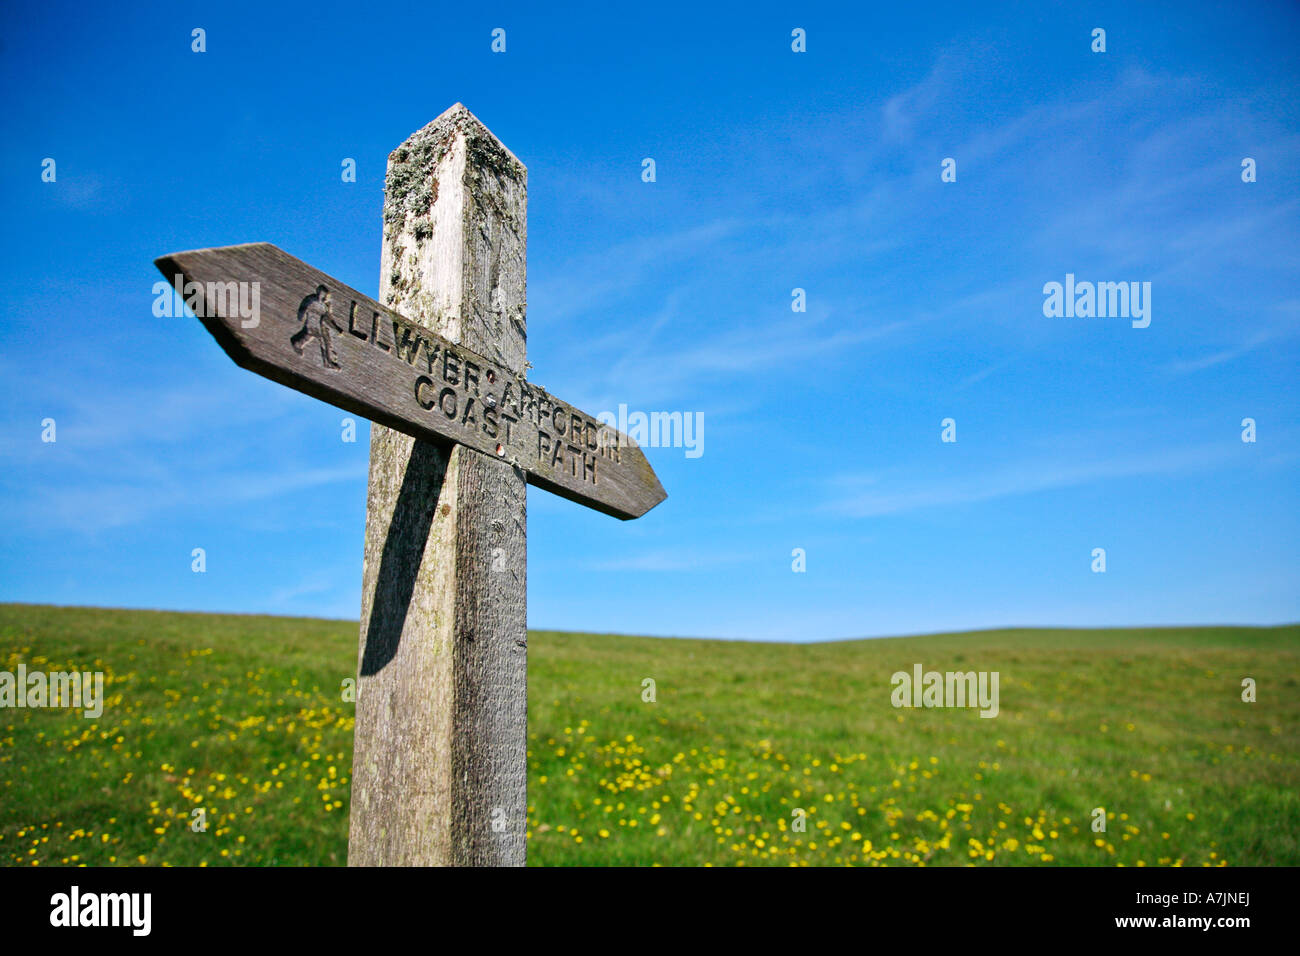 Signpost along the Pembrokeshire coast path National Trail - Stock Image